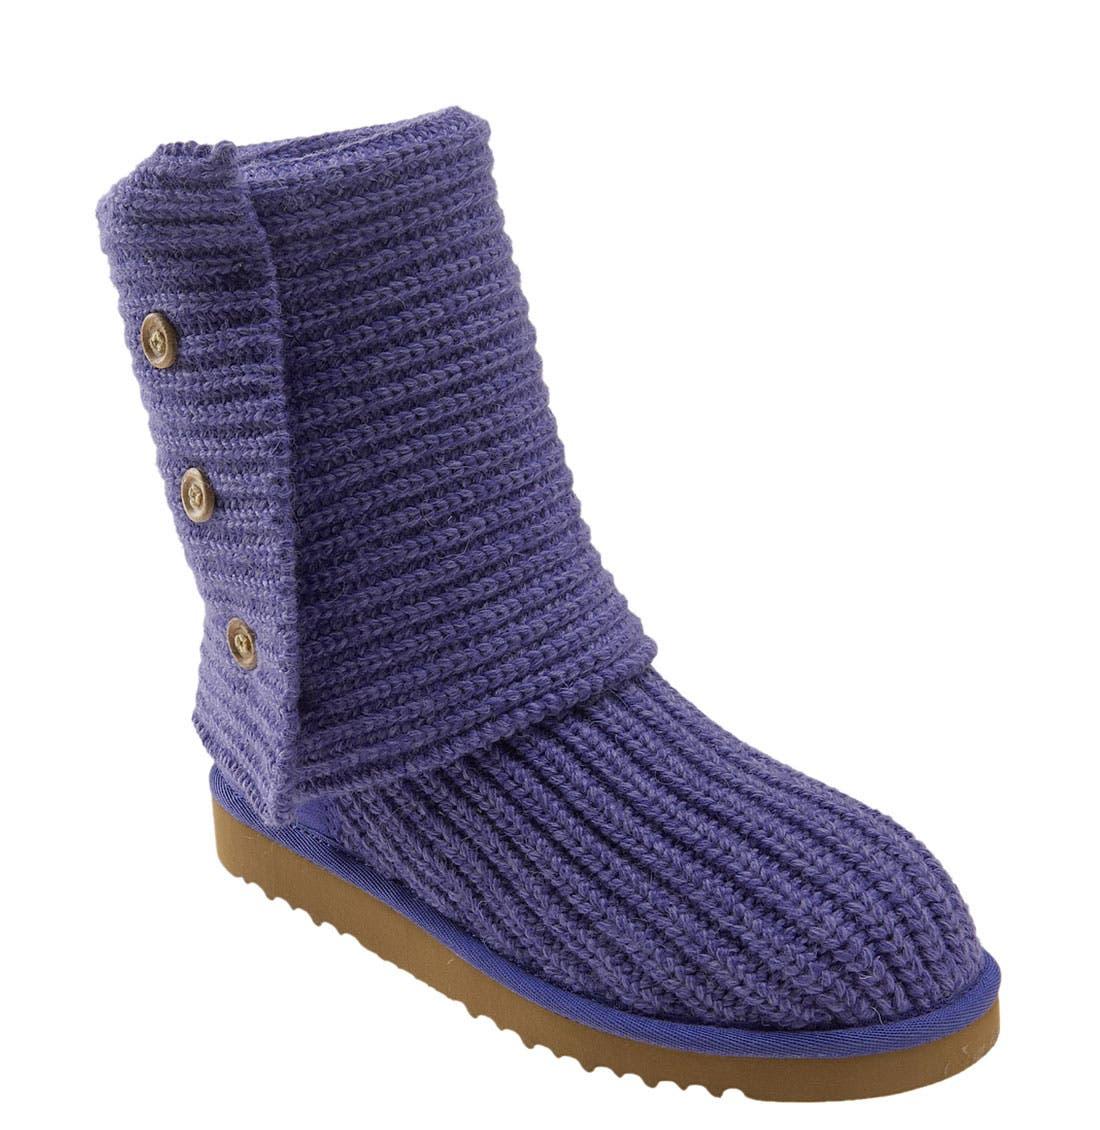 ugg cardy boots | eBay